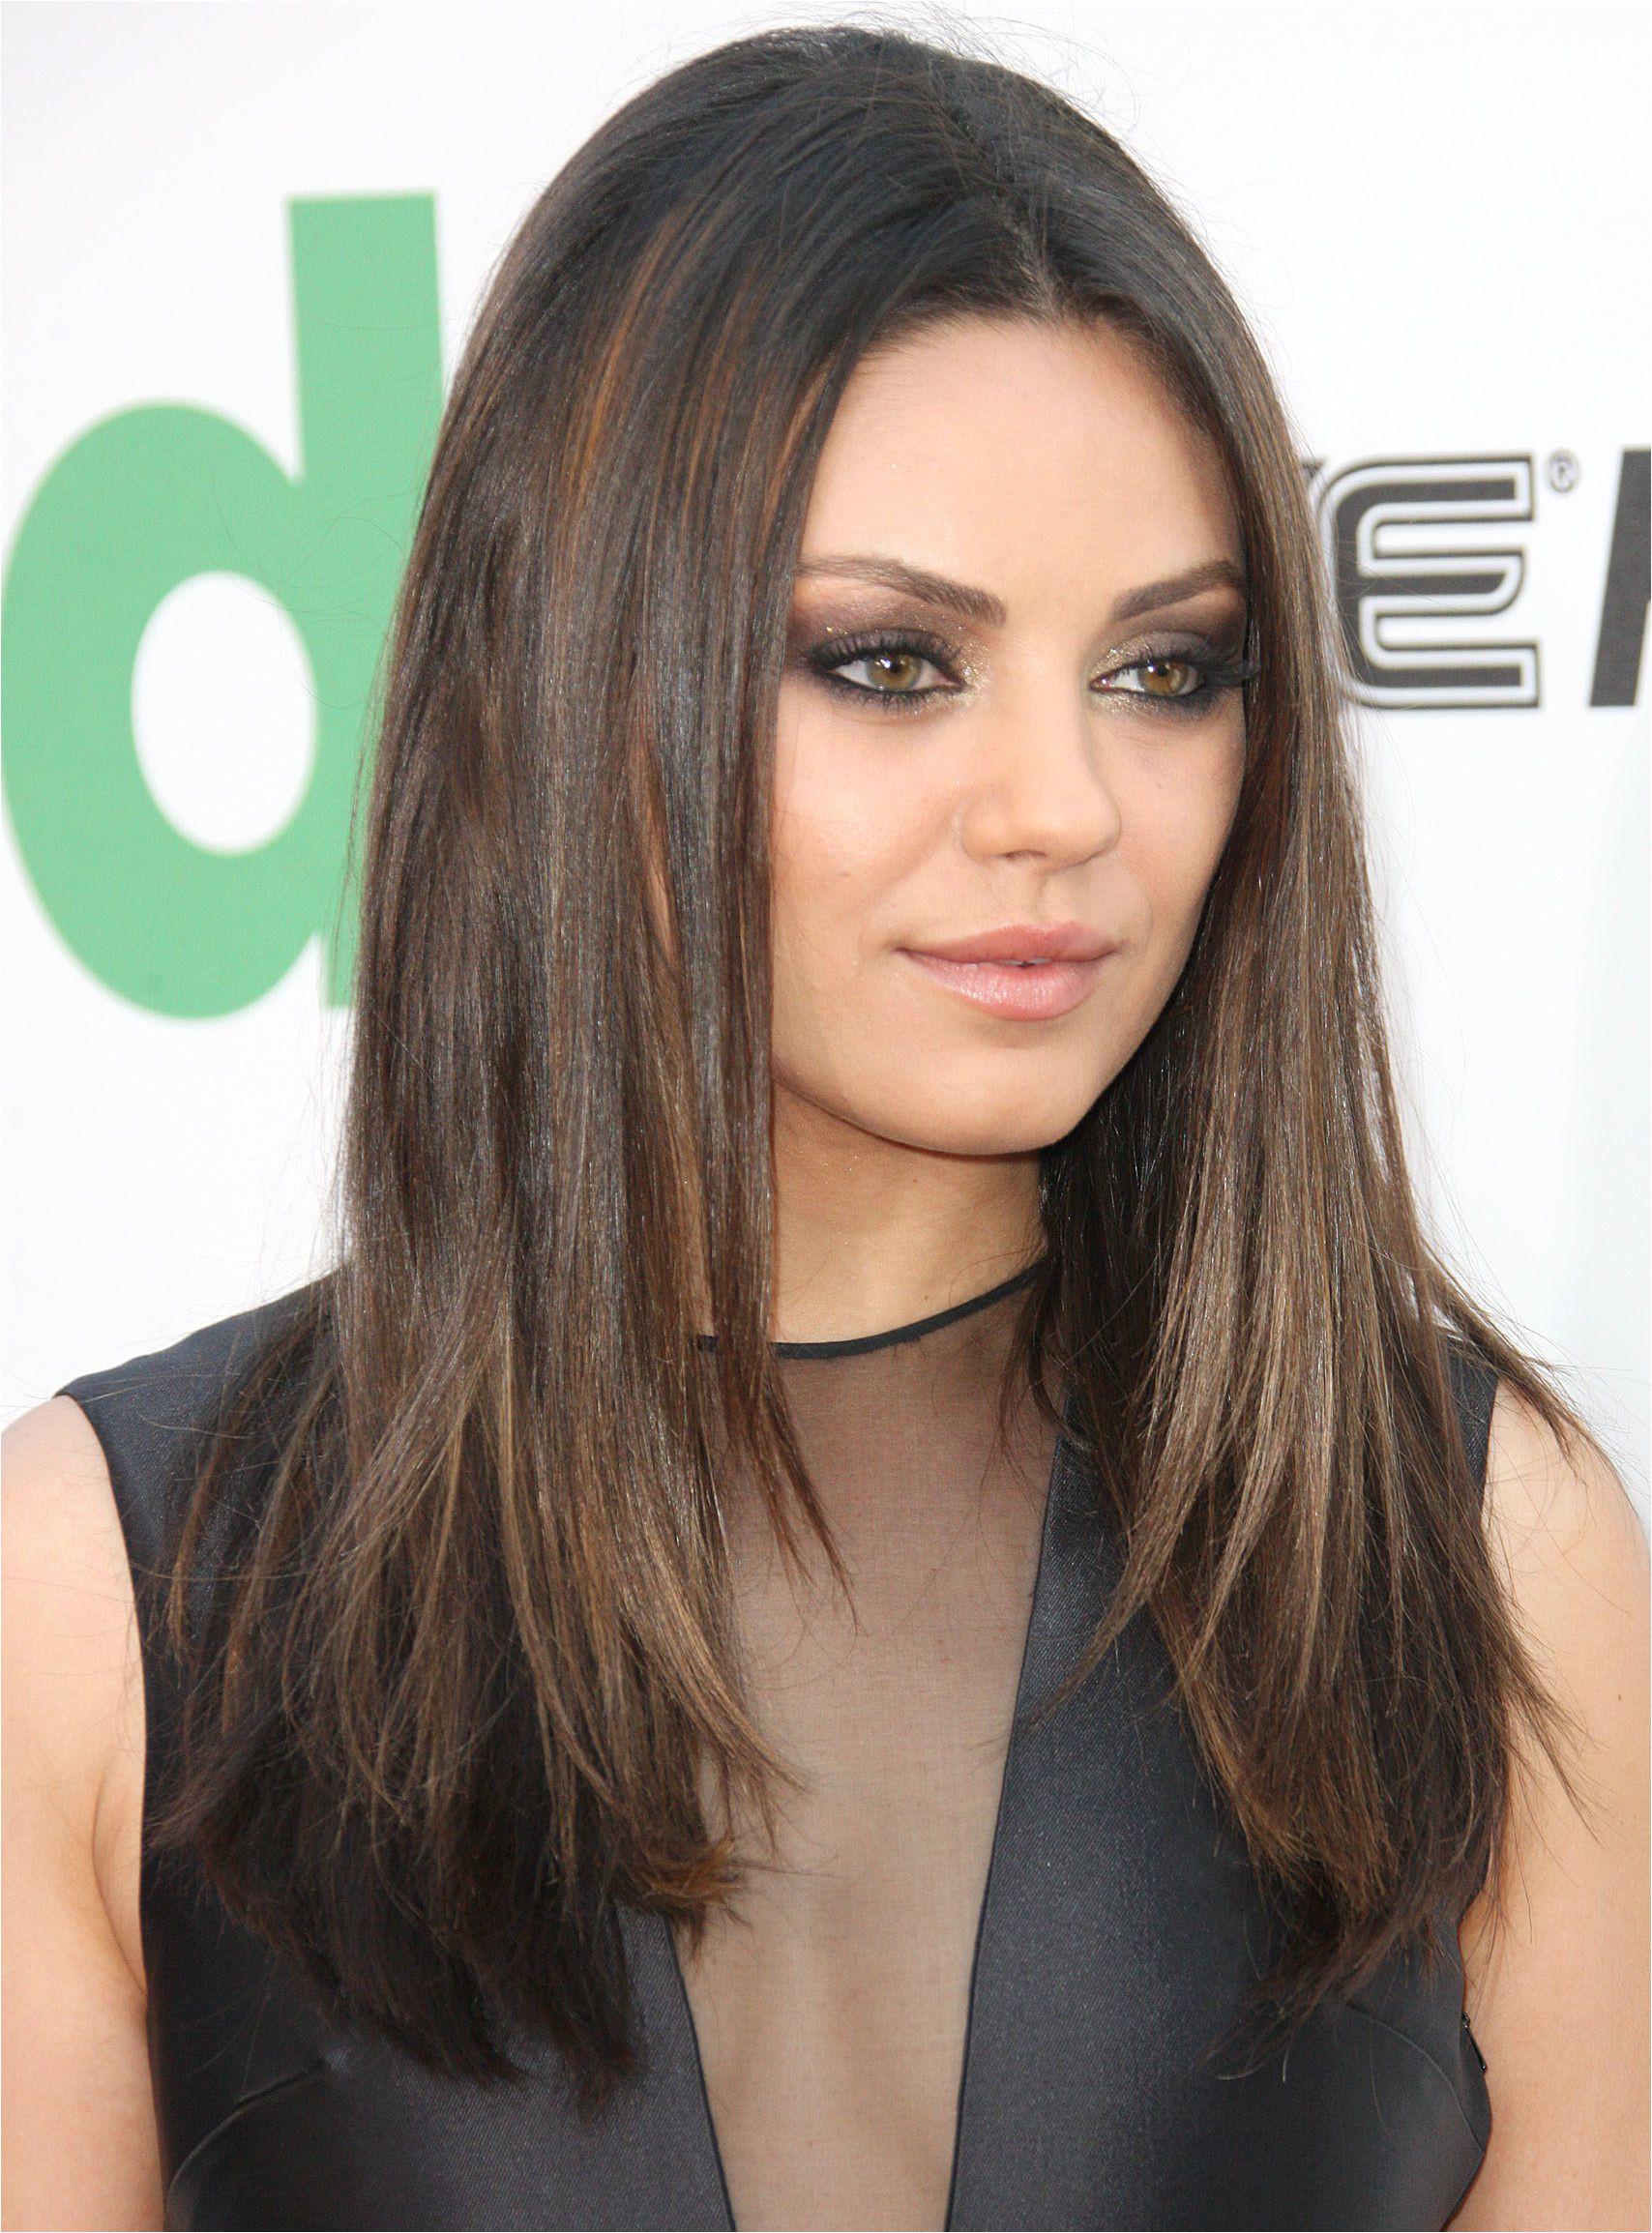 mila kunis long hair 56a083f55f9b58eba4b131eb